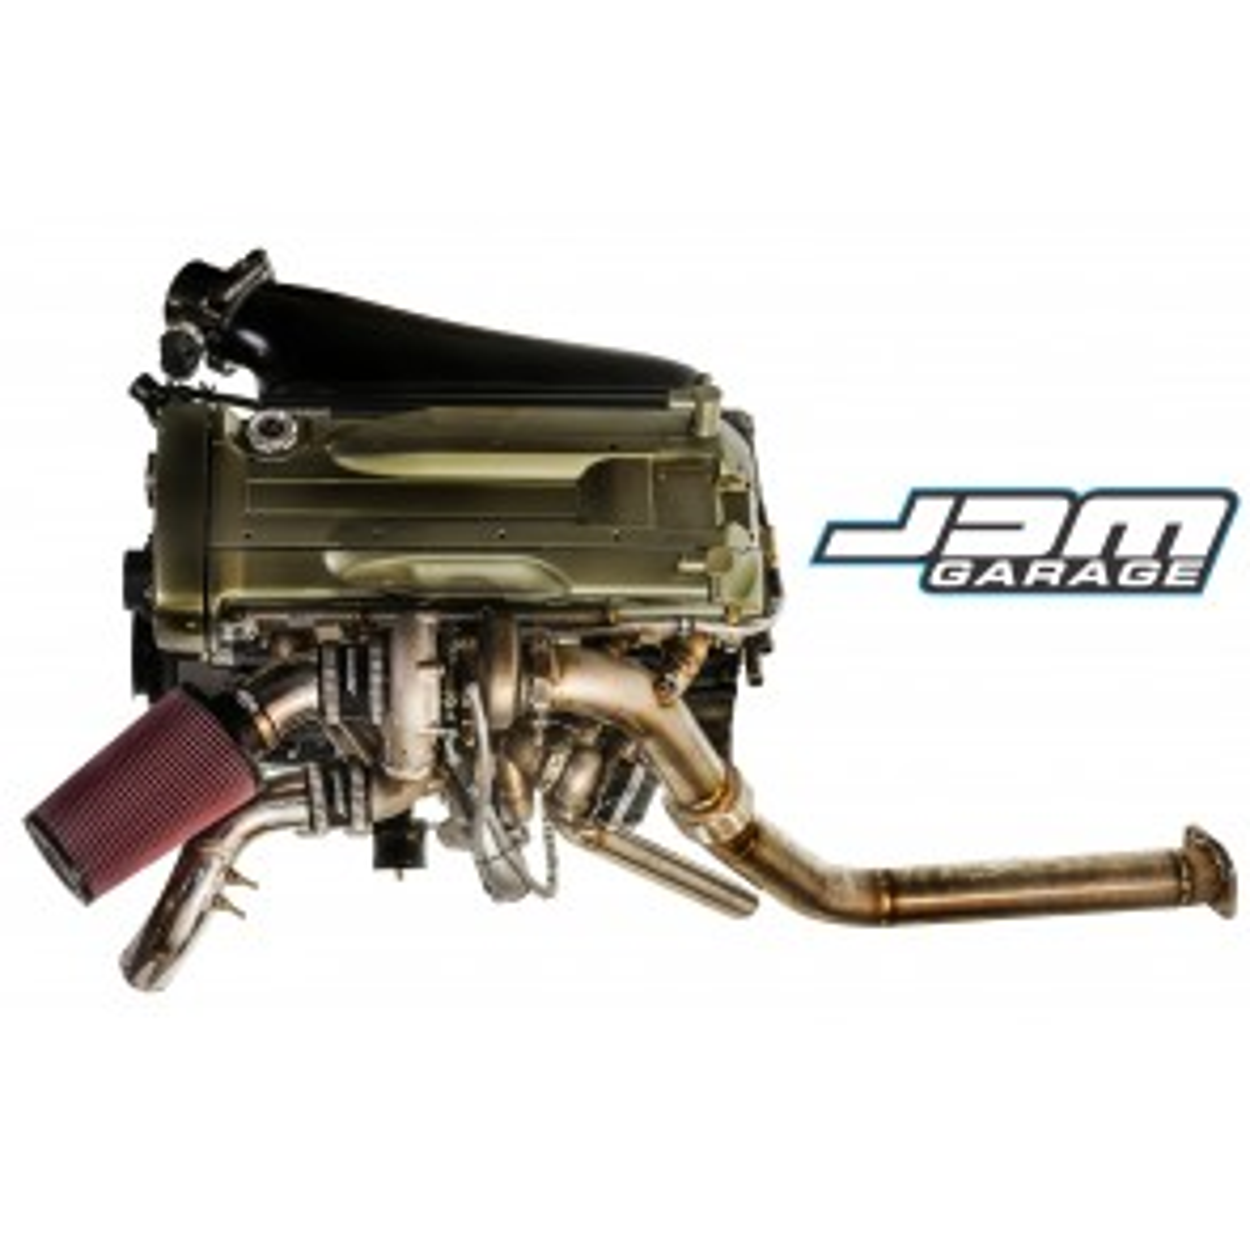 JDM Garage Turbo Kit - Fits Nissan Skyline RB25 & RB26